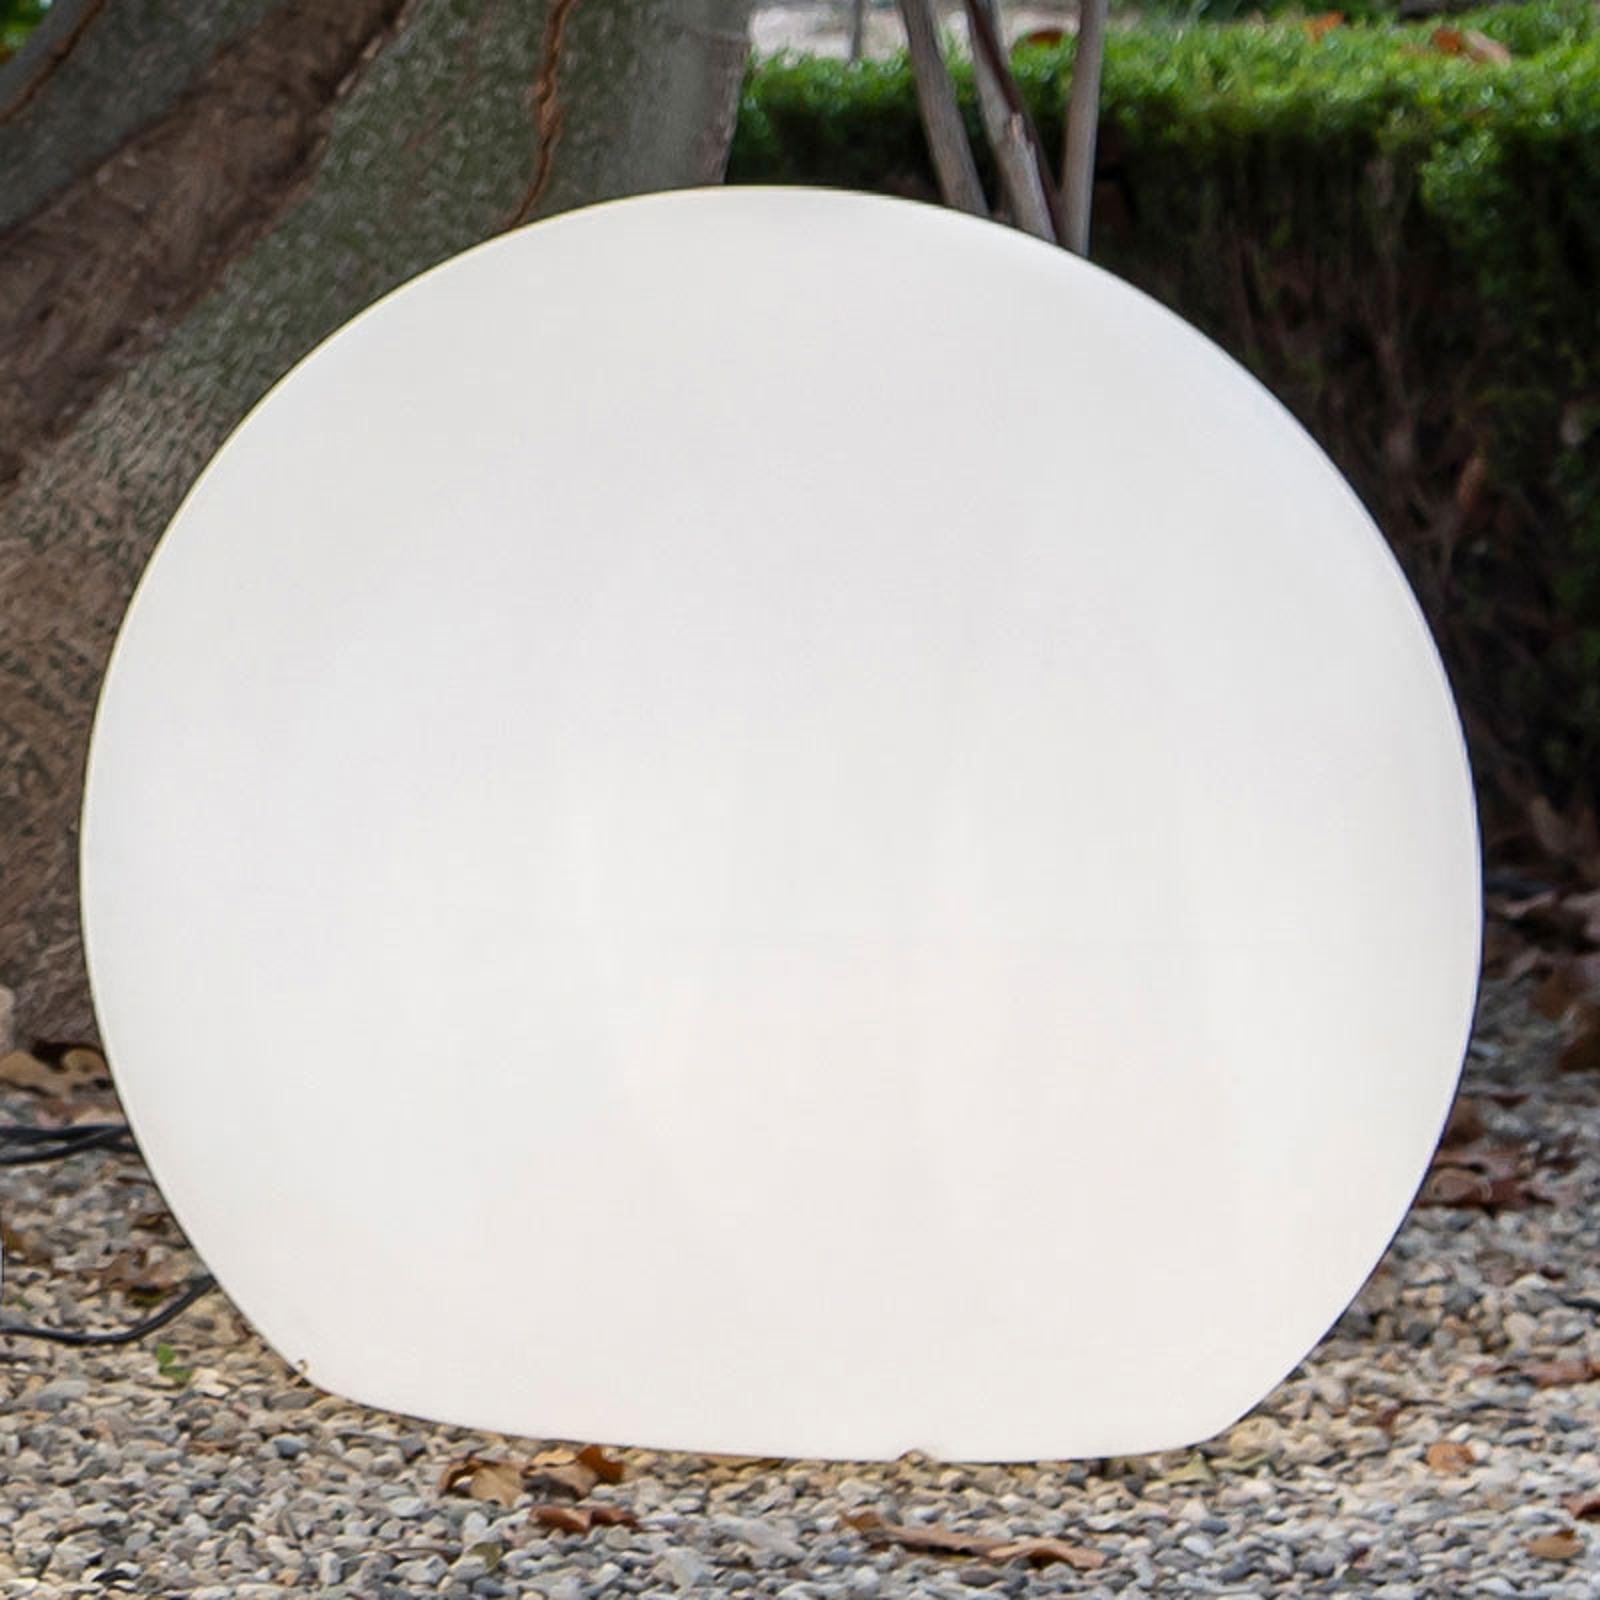 Newgarden Buly golvlampa i kulform, Ø 80 cm